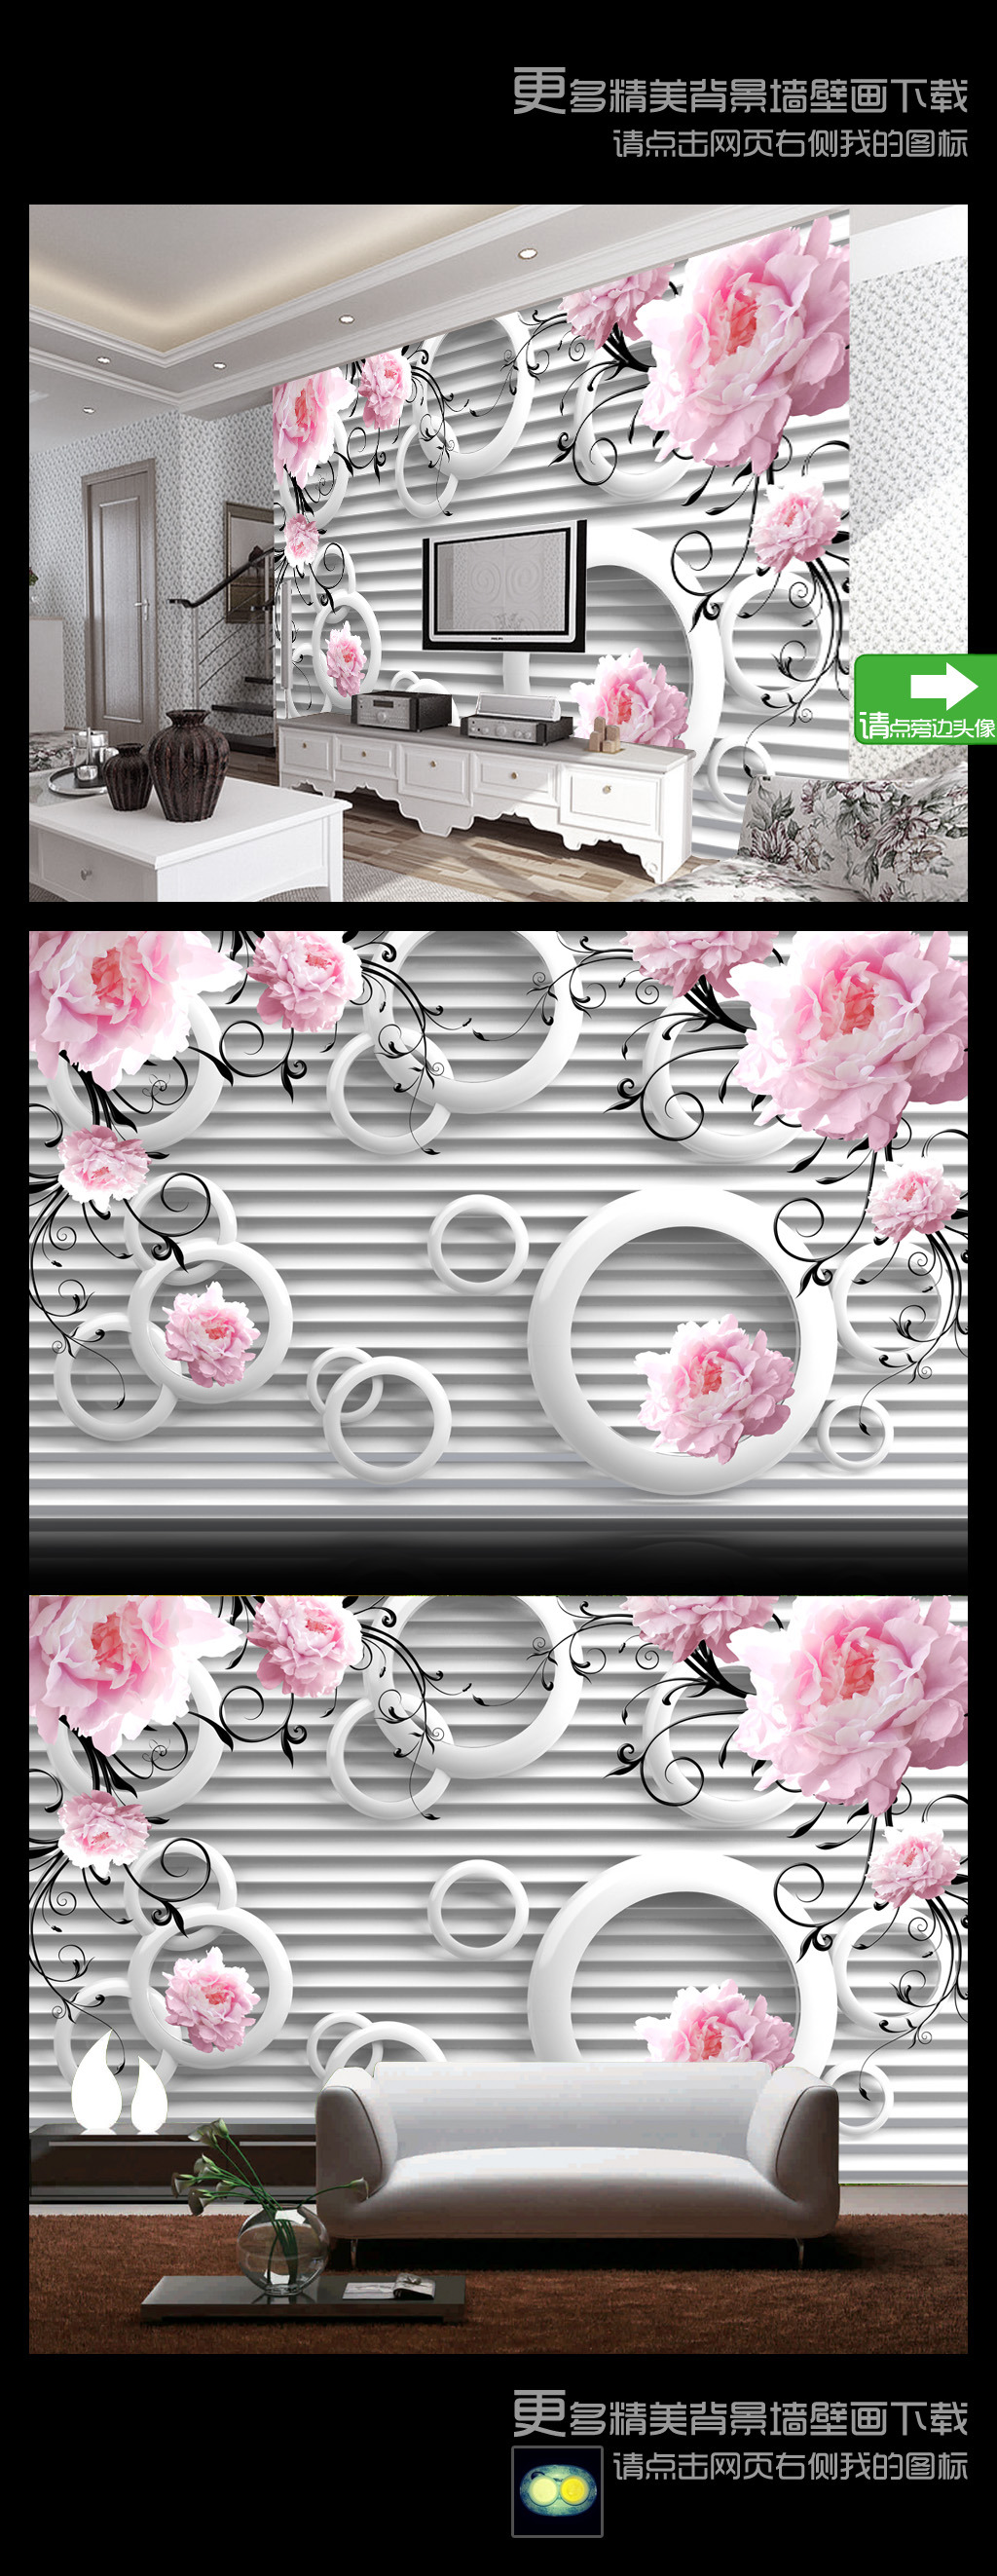 3d壁画 背景墙 电视墙 玫瑰花 月季花 粉色花 抽象简约花 创意背景墙